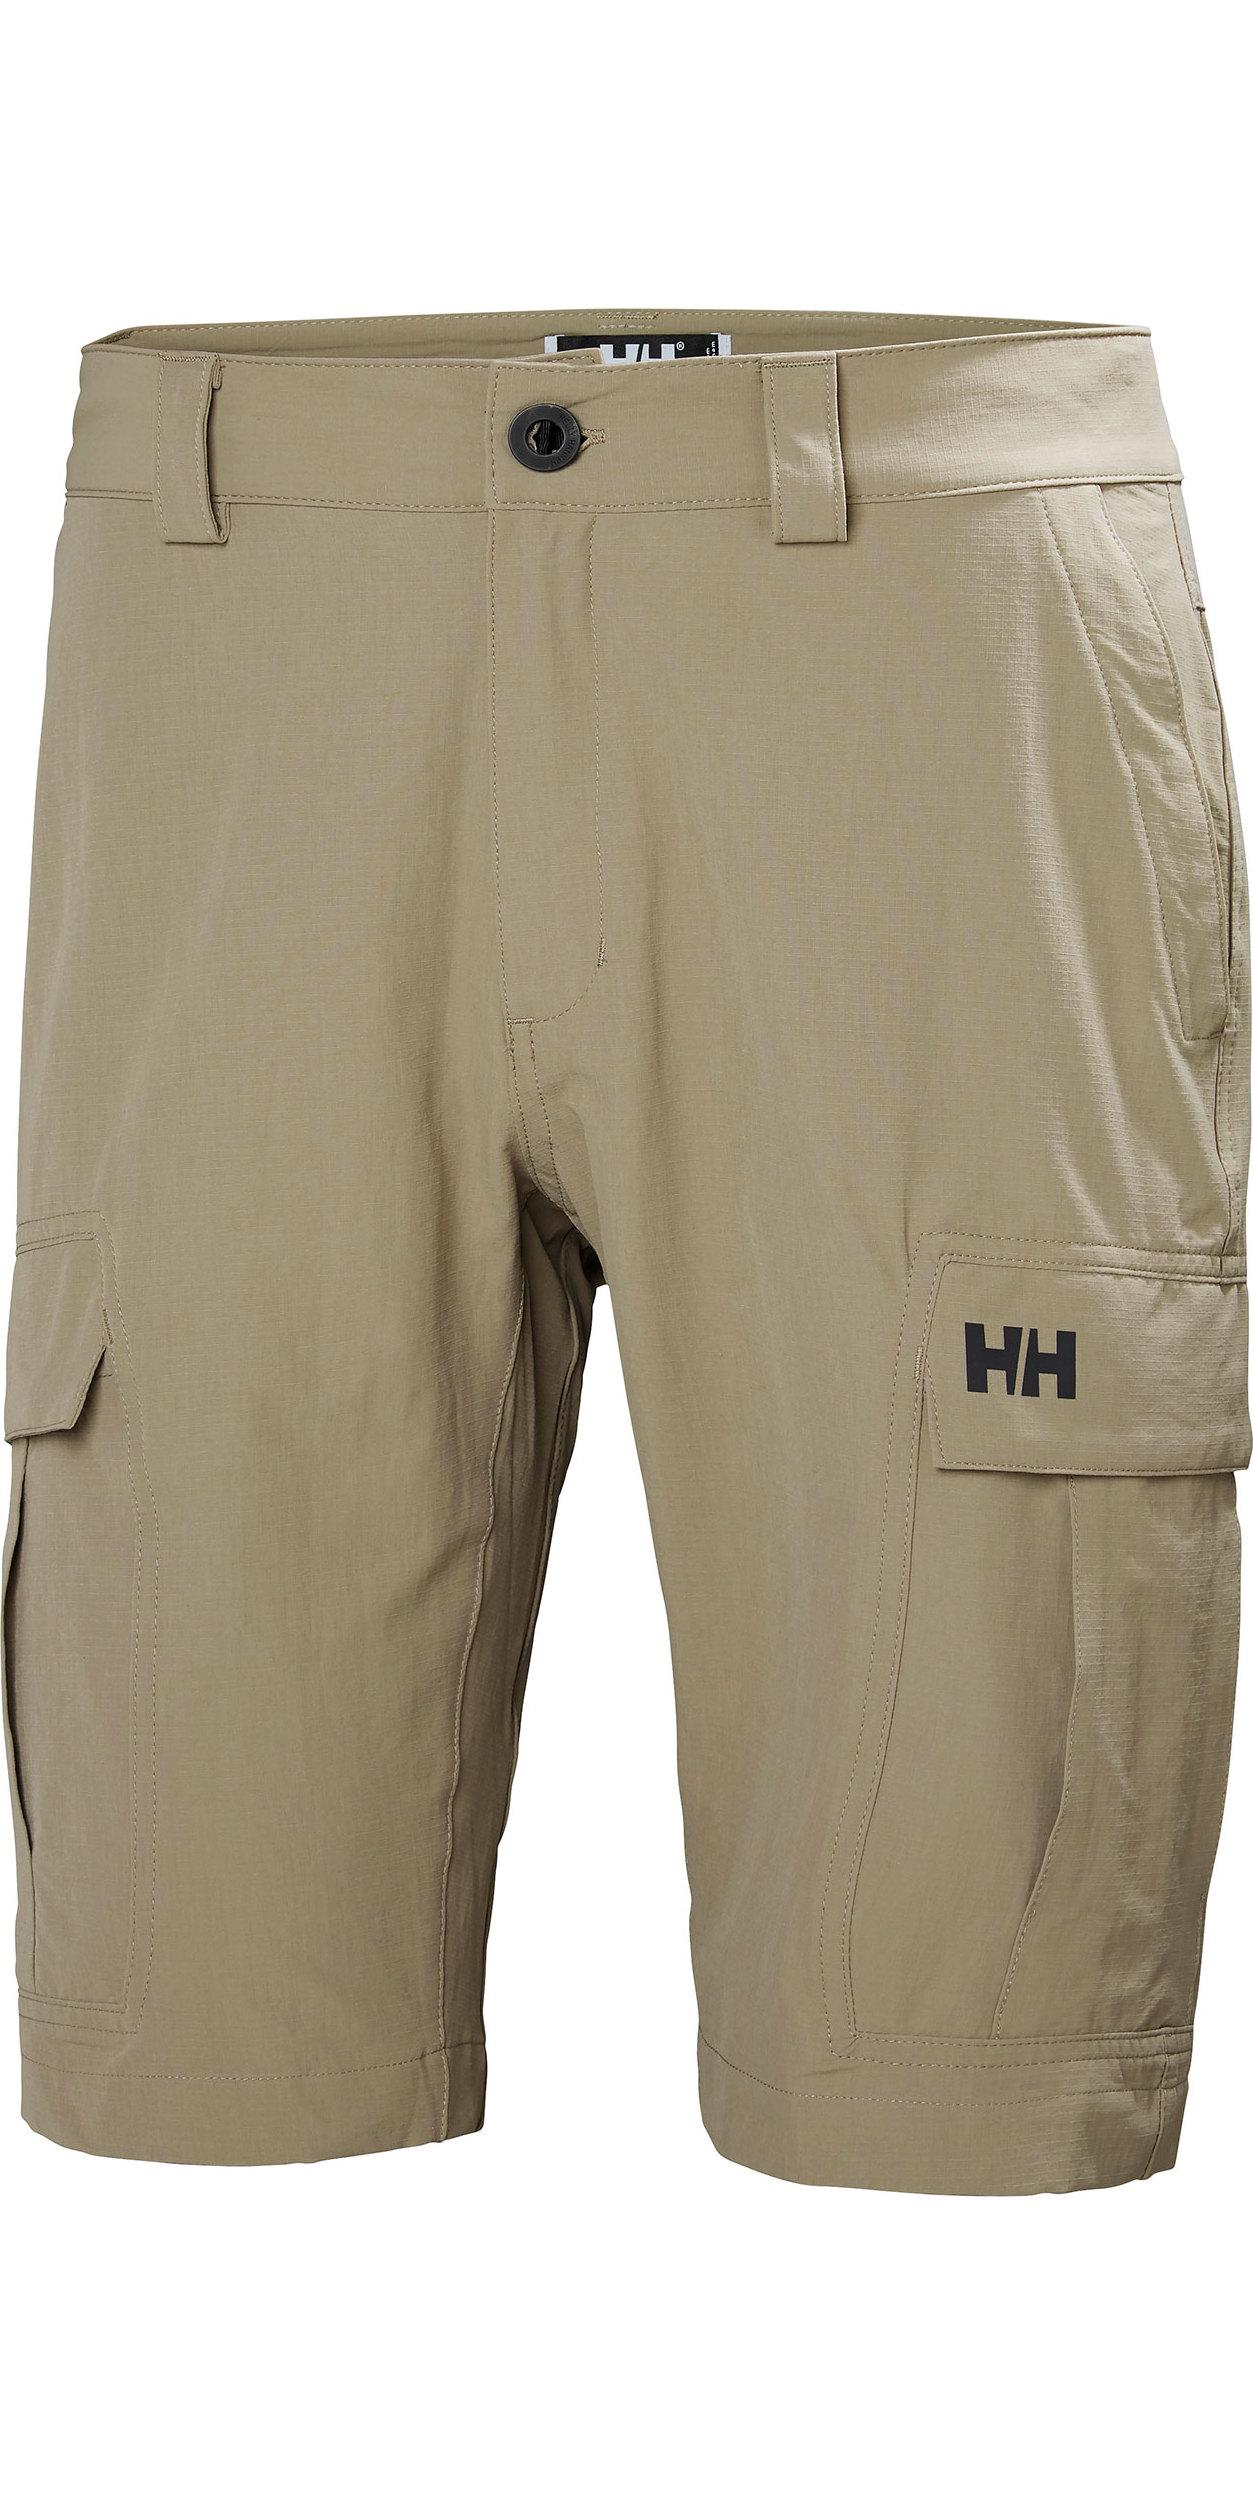 huge range of latest discount double coupon 2019 Helly Hansen Mens QD Cargo Shorts Fallen Rock 54154